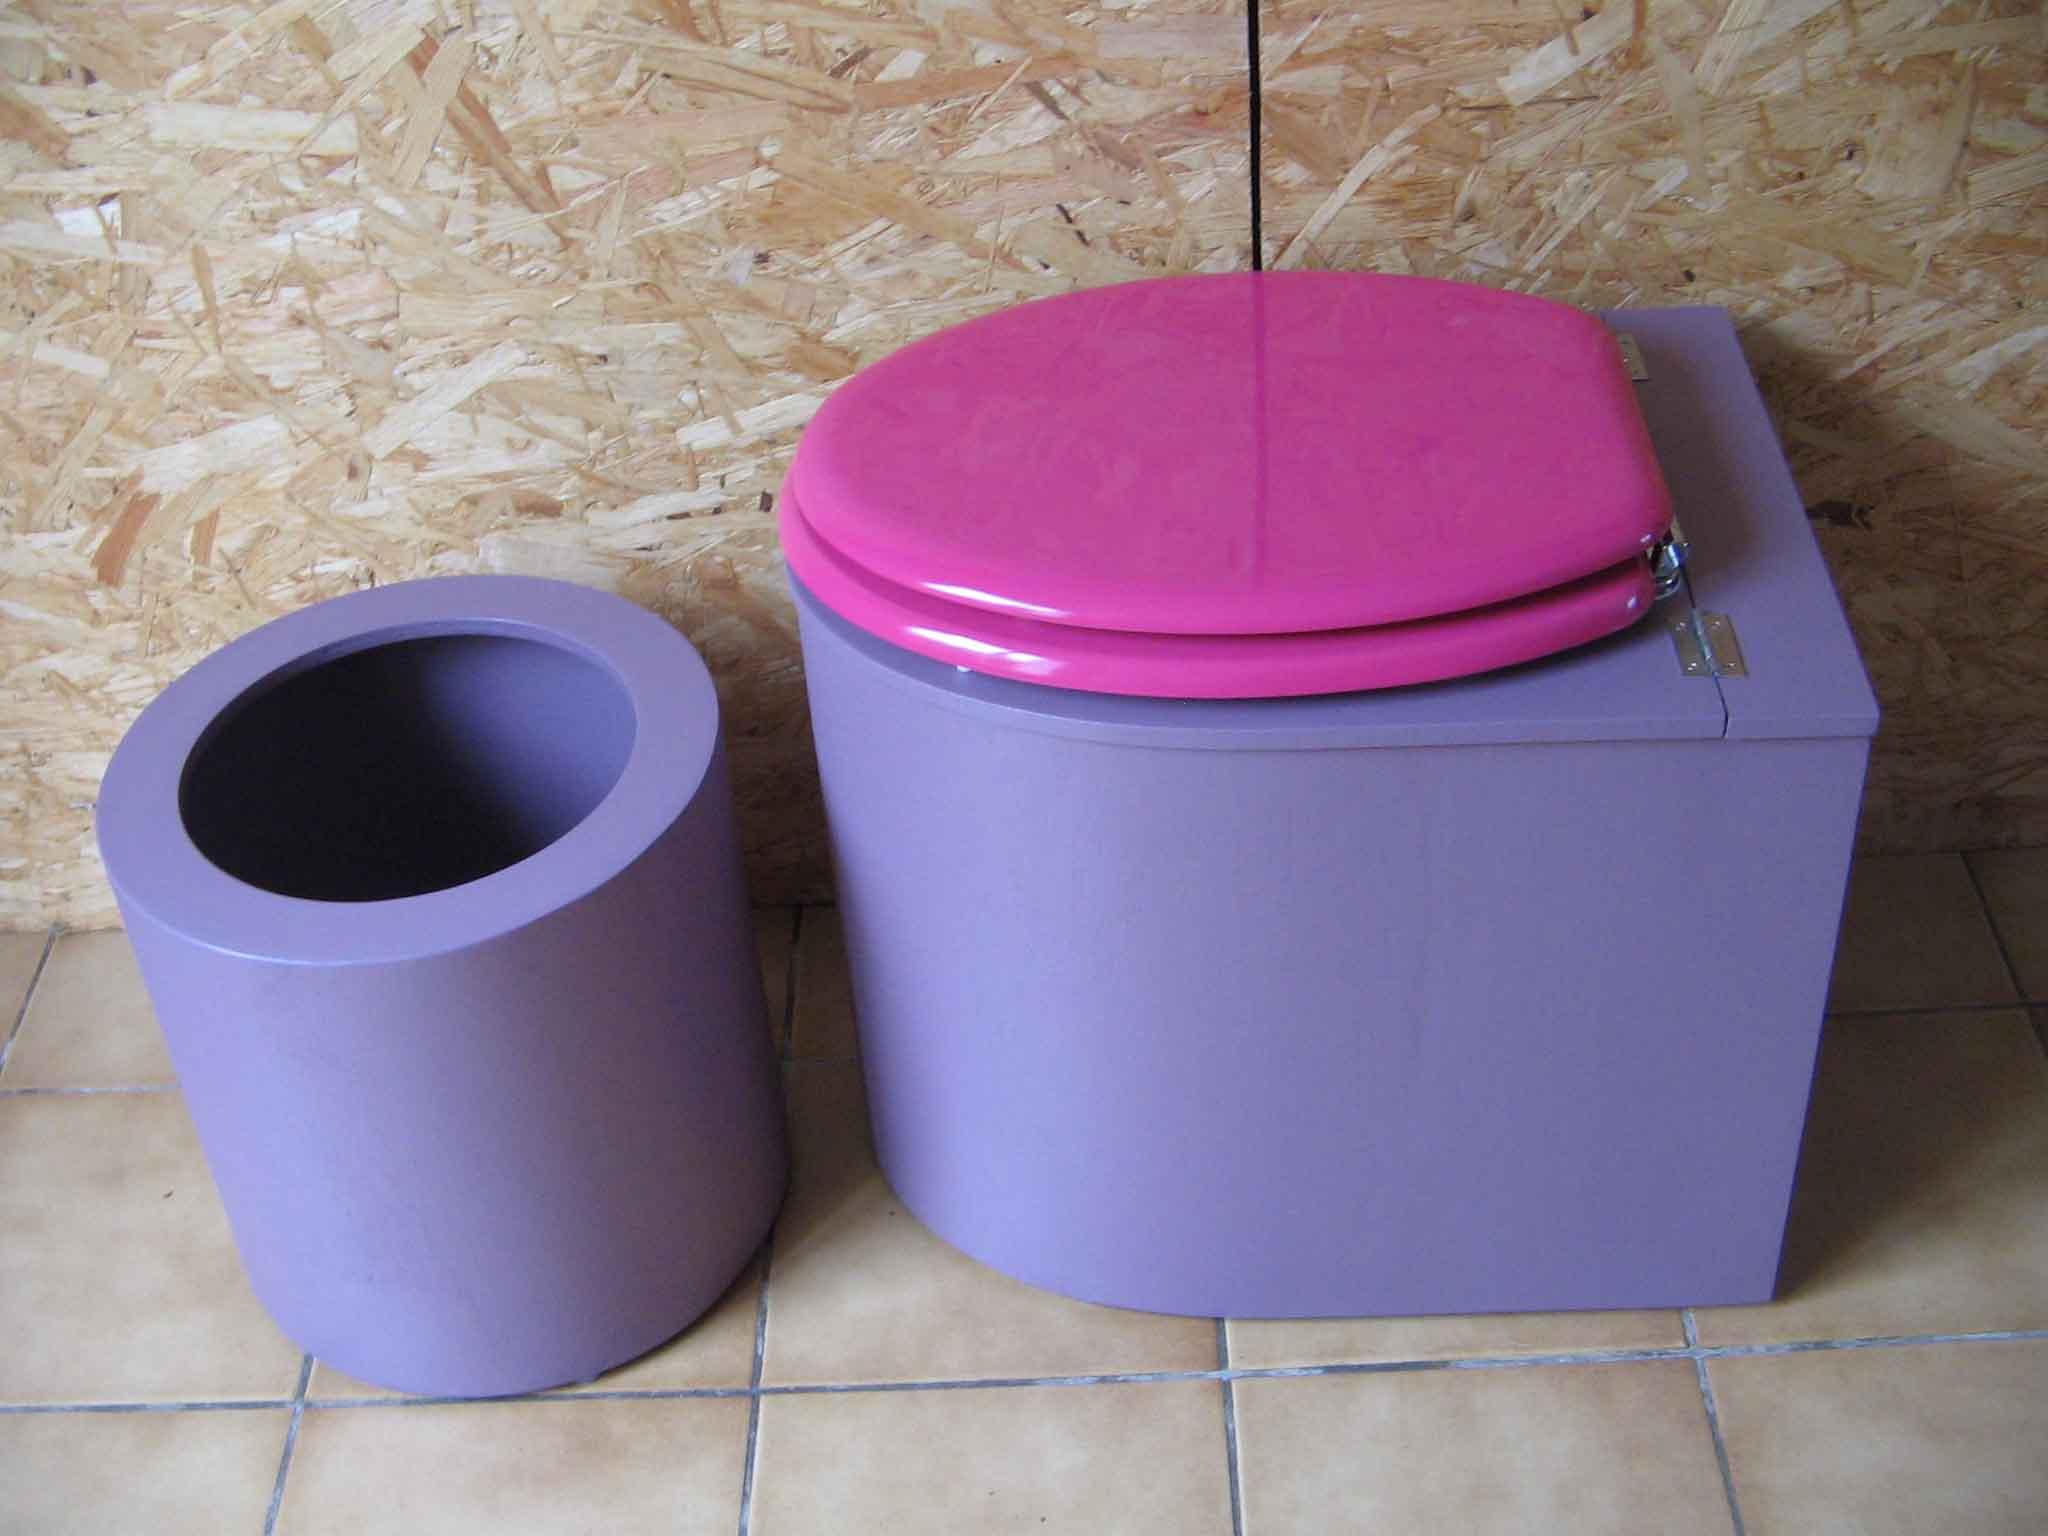 Toilettes sèches design violette